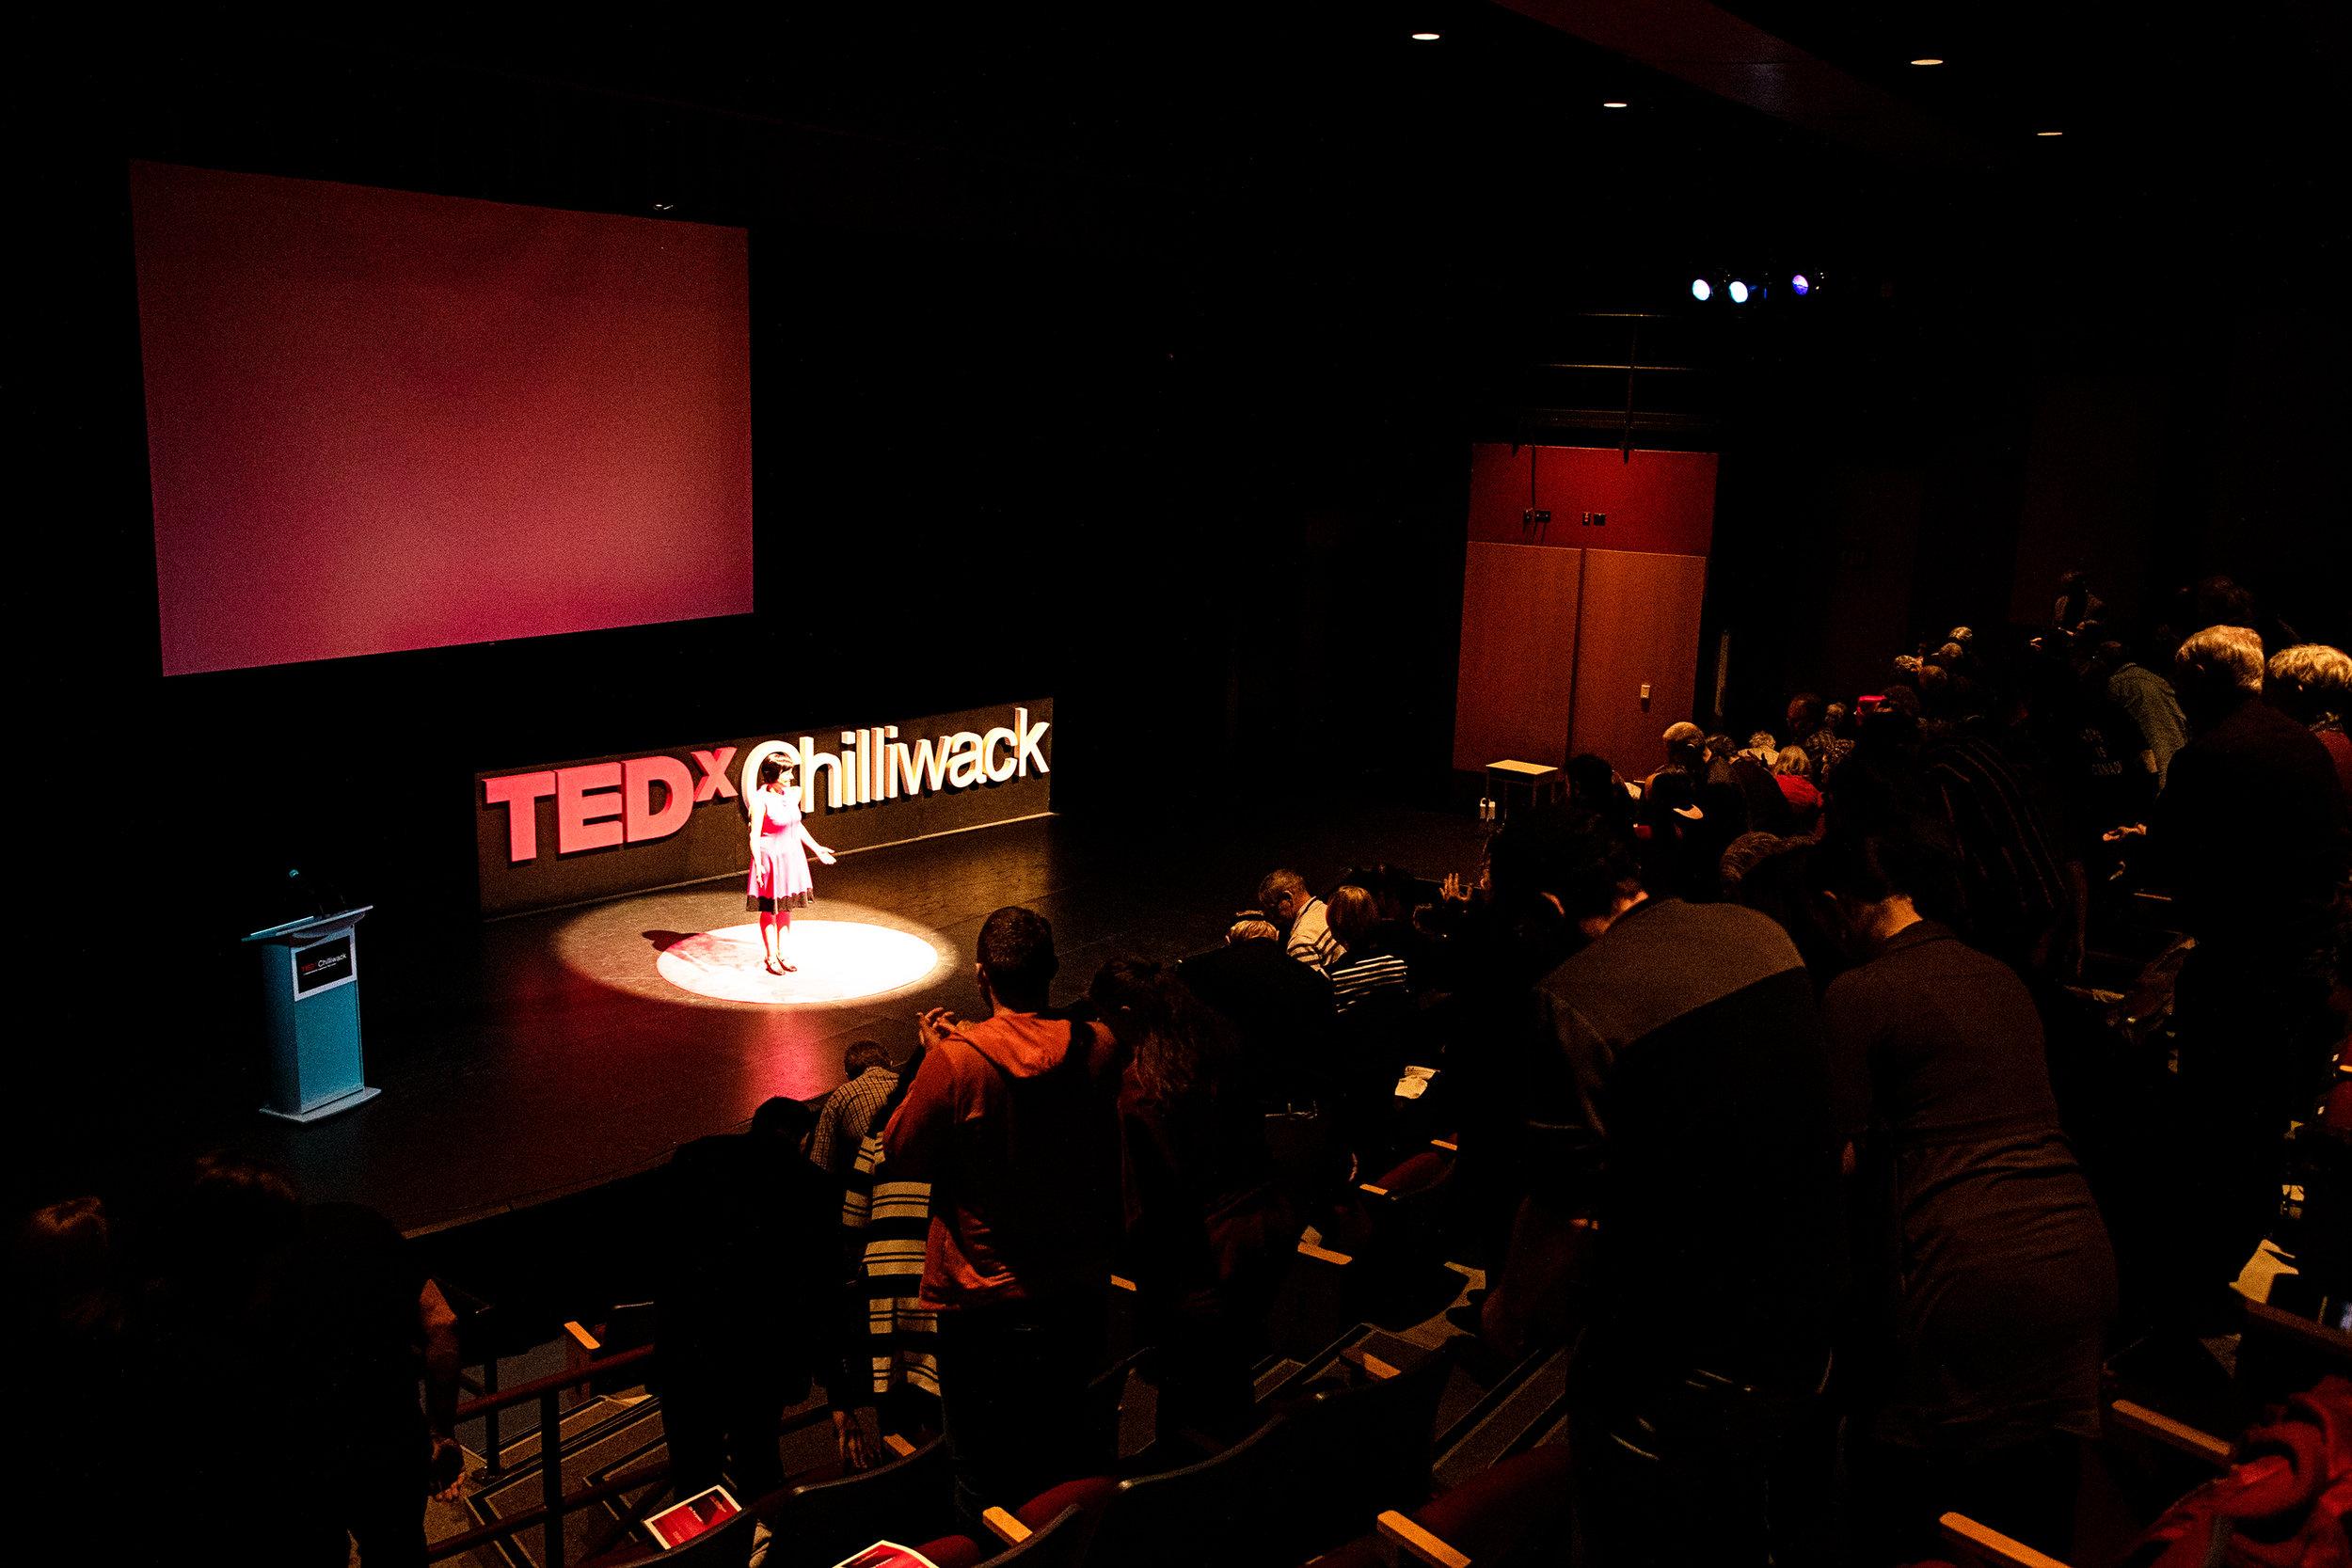 TEDX_01.jpg